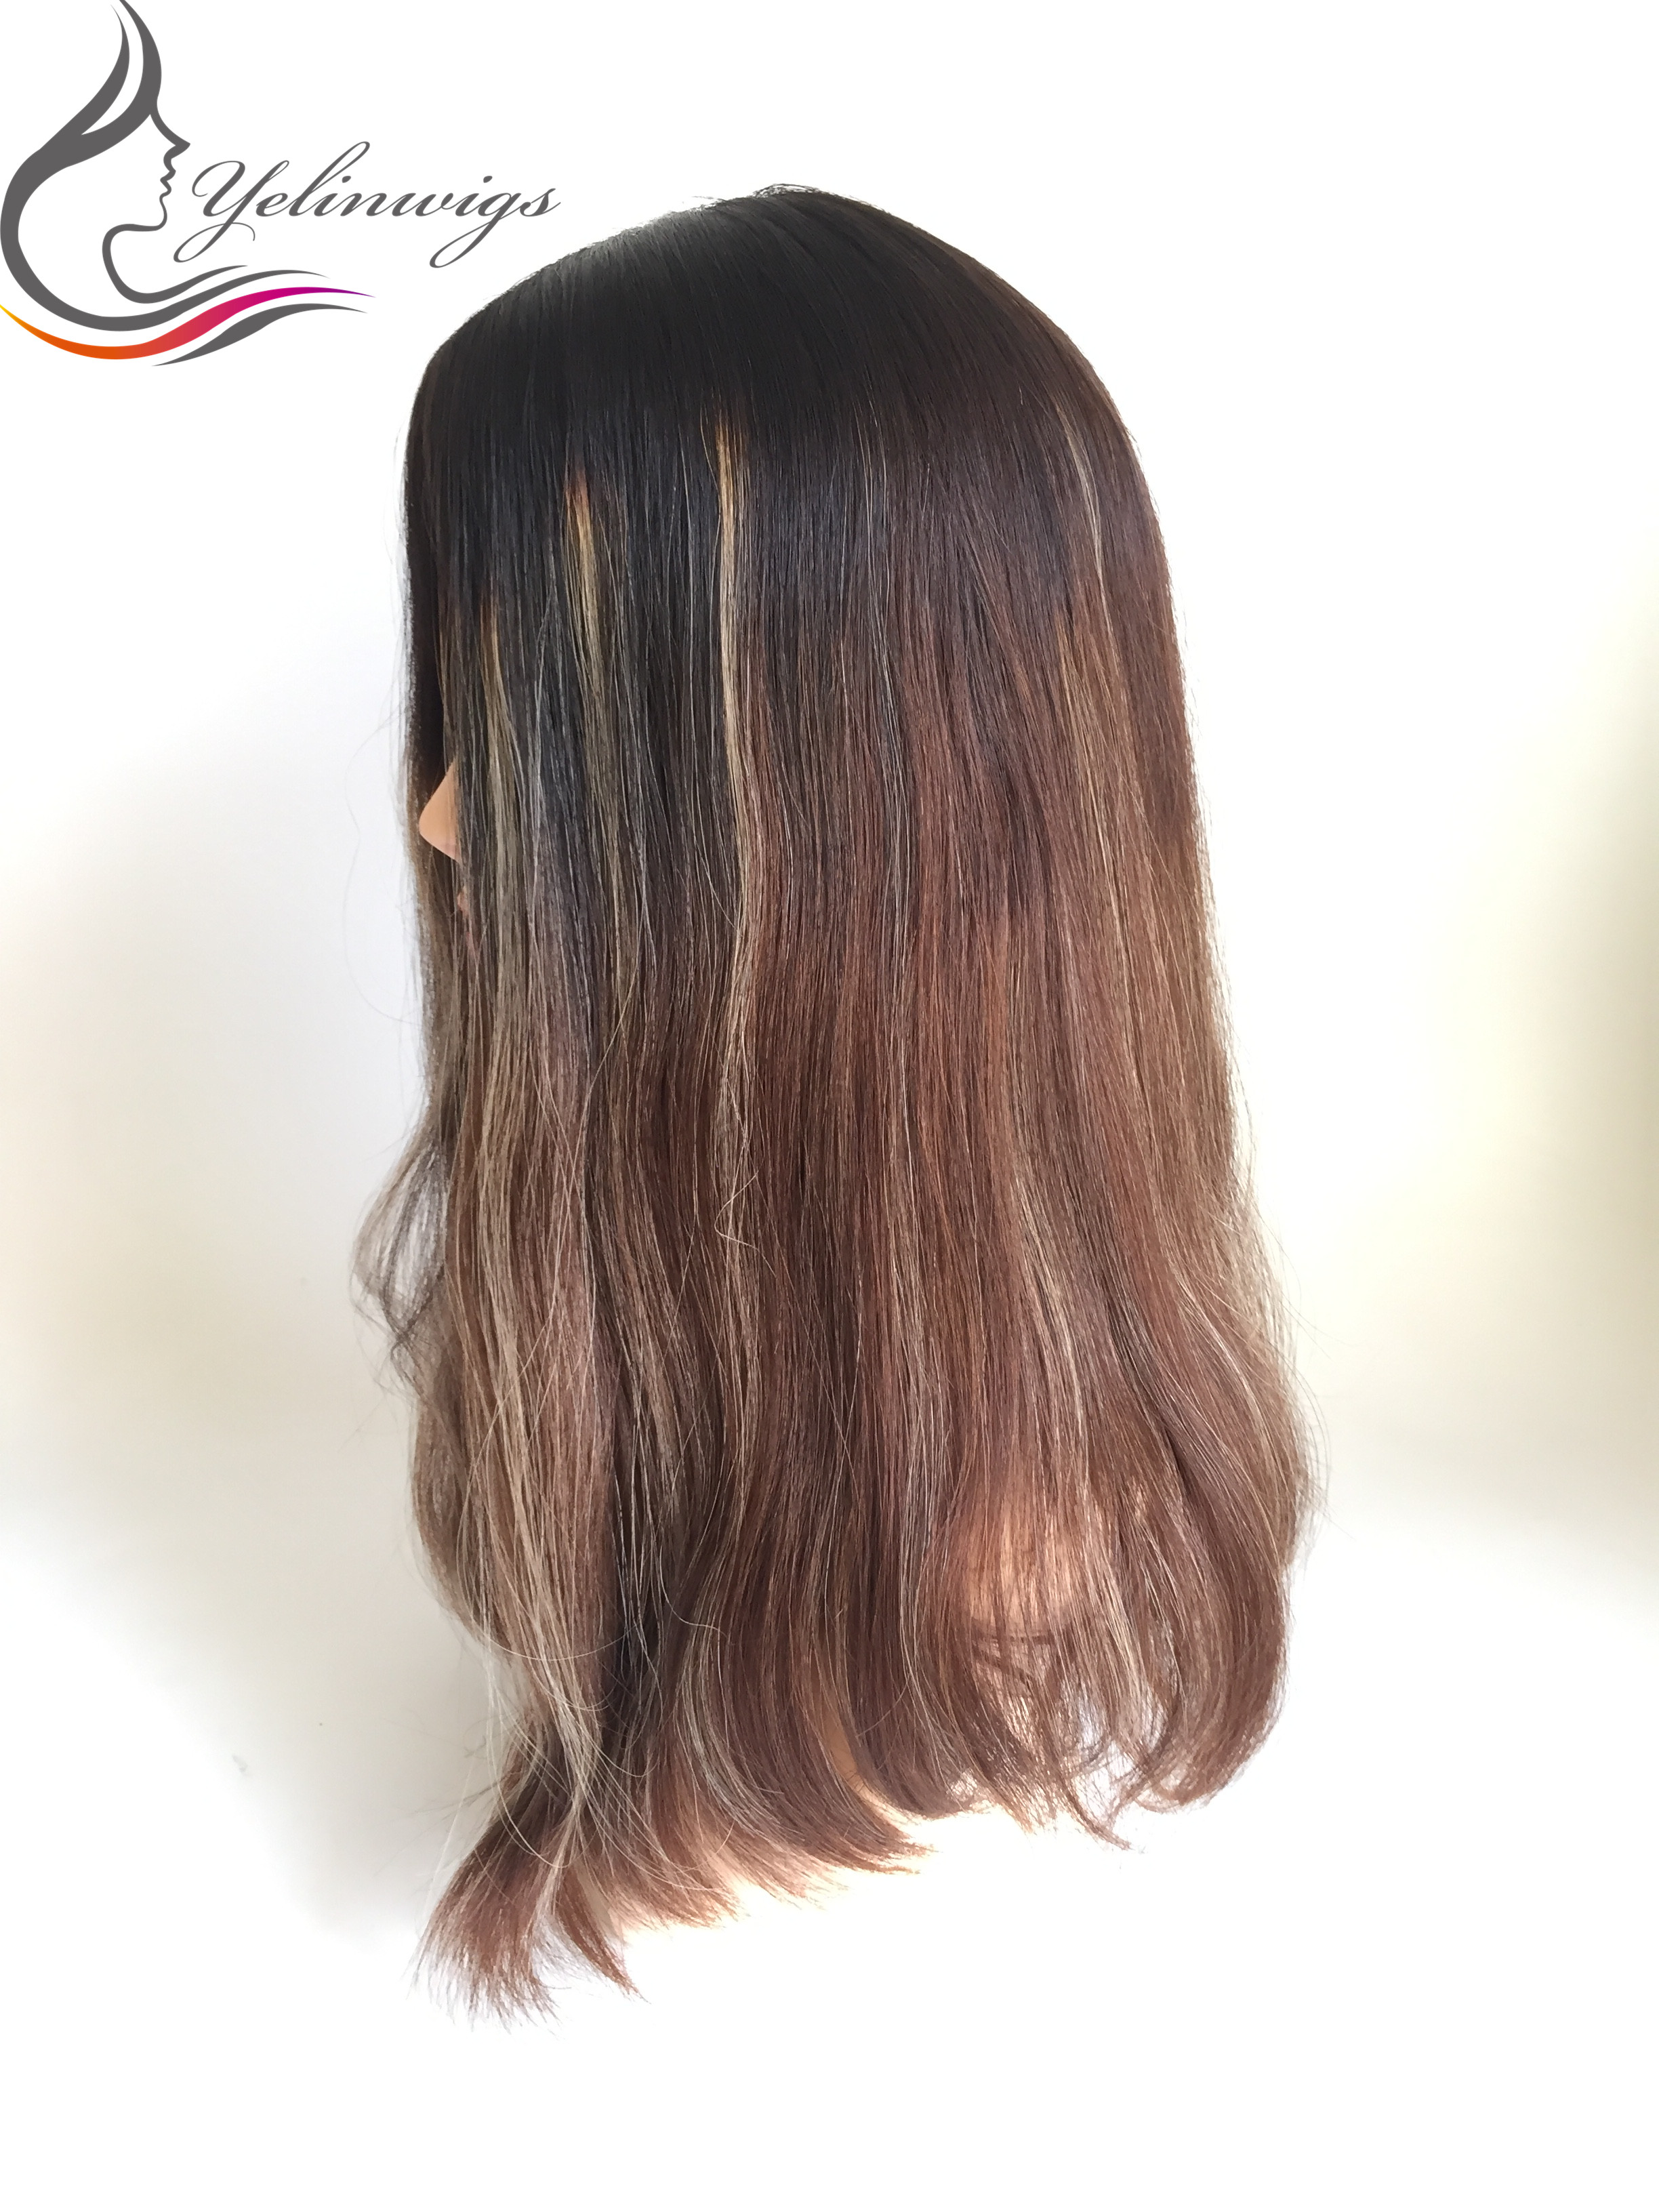 Bob Style Euroepan Hair Virgin Hair Jewish Cap Wig Kosher Wigs Silk Top With Machine Made Weft At Back